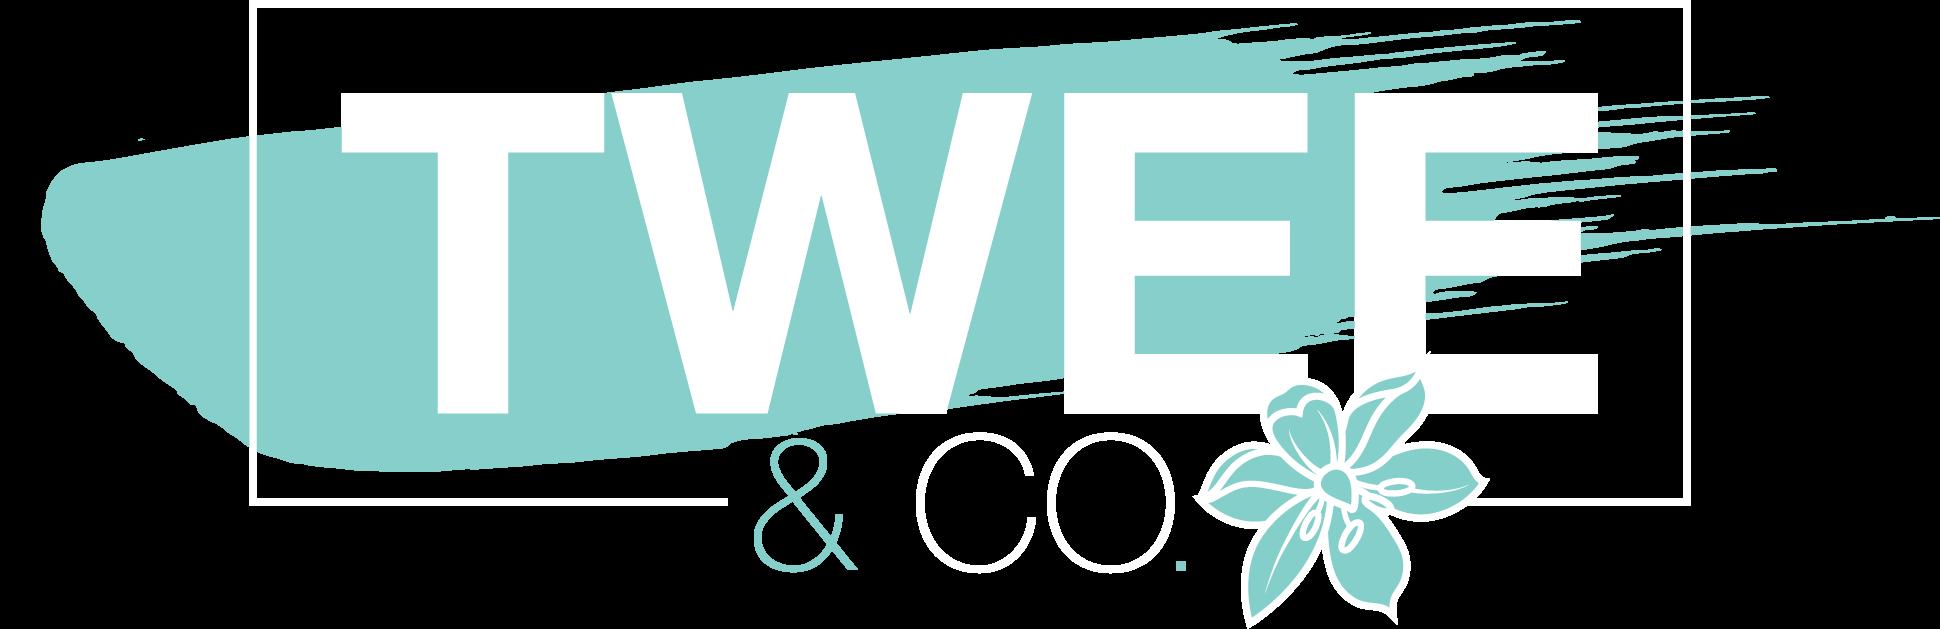 Twee and company logo